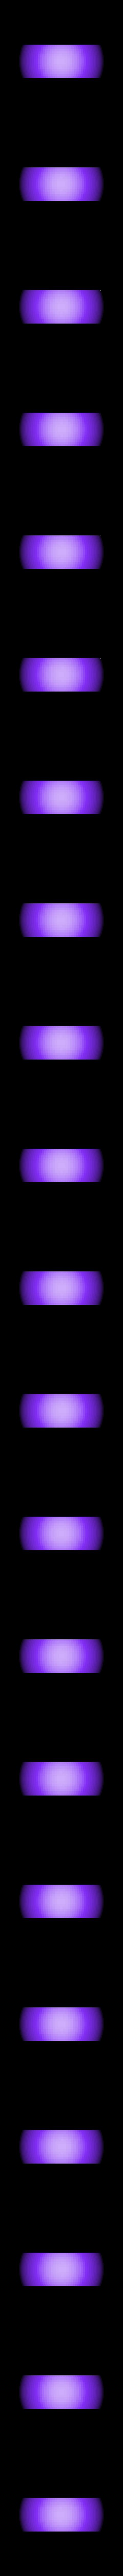 Small_Ring.stl Télécharger fichier STL gratuit Aegis-fang- Wulfgar's Hammer (Imprimable) • Objet imprimable en 3D, derailed